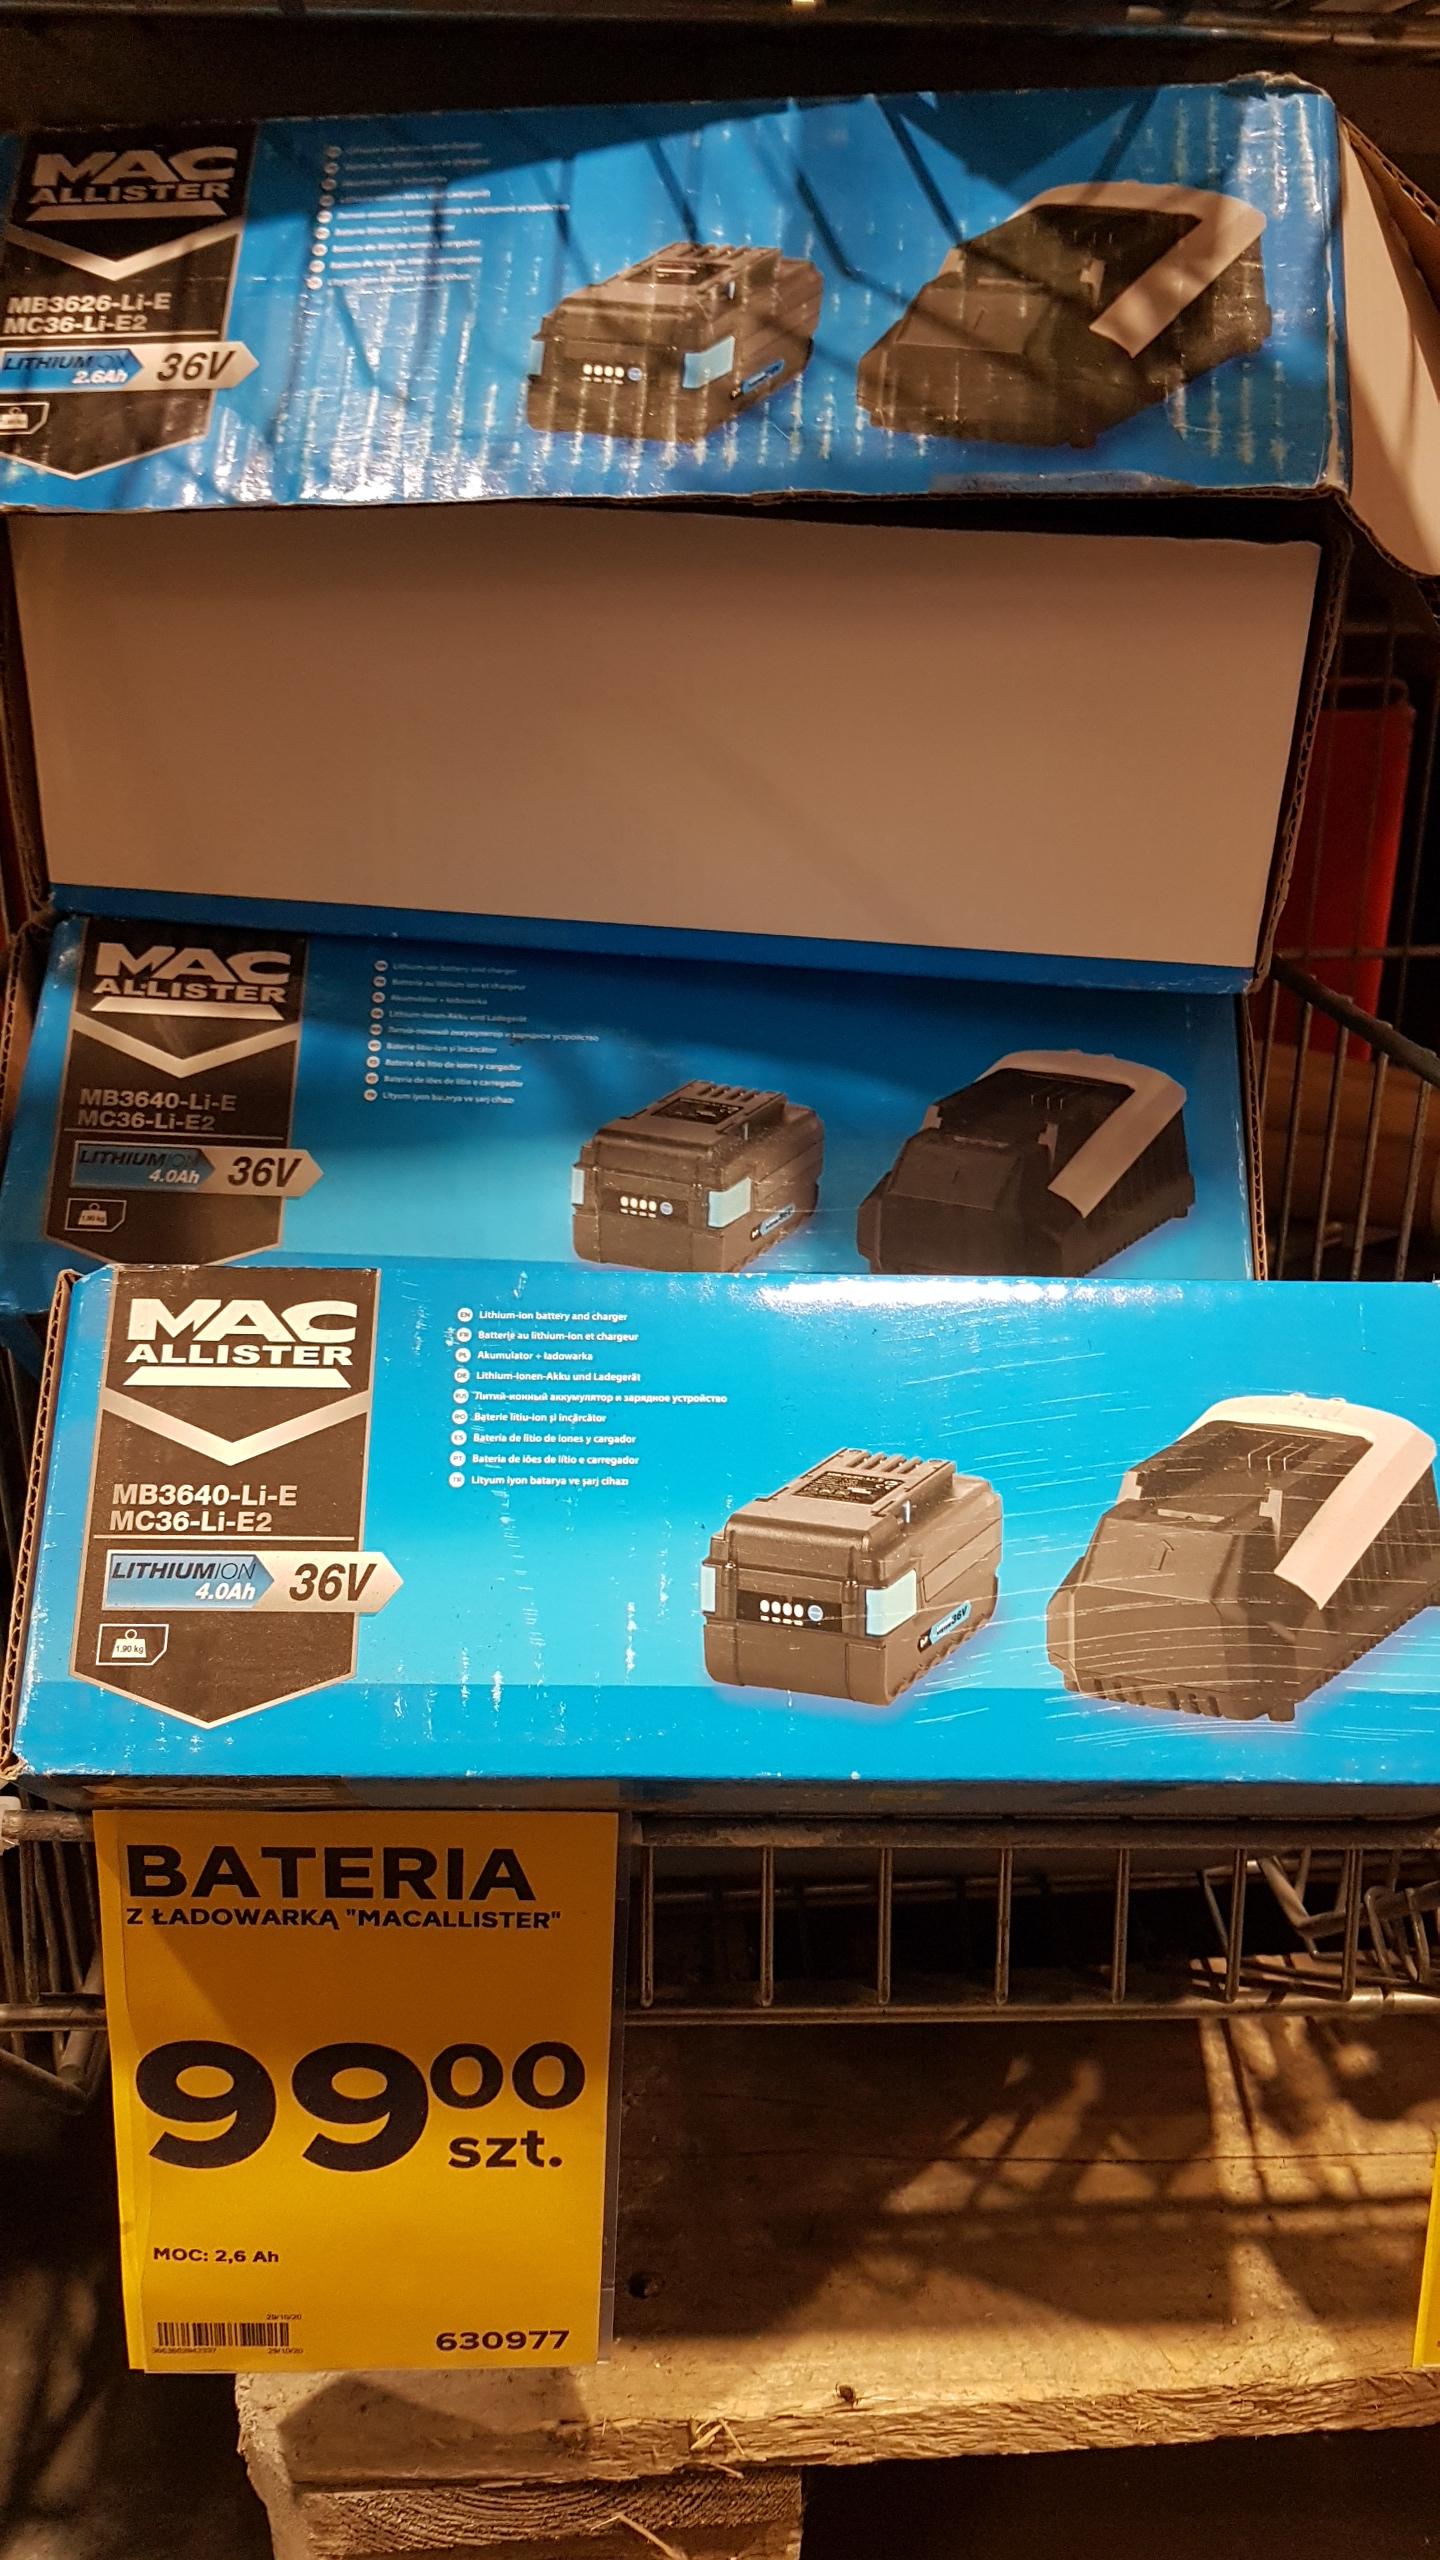 Akumulator MacAllister 36V + ladowarka, MEGA OKAZJA w Brico Depot